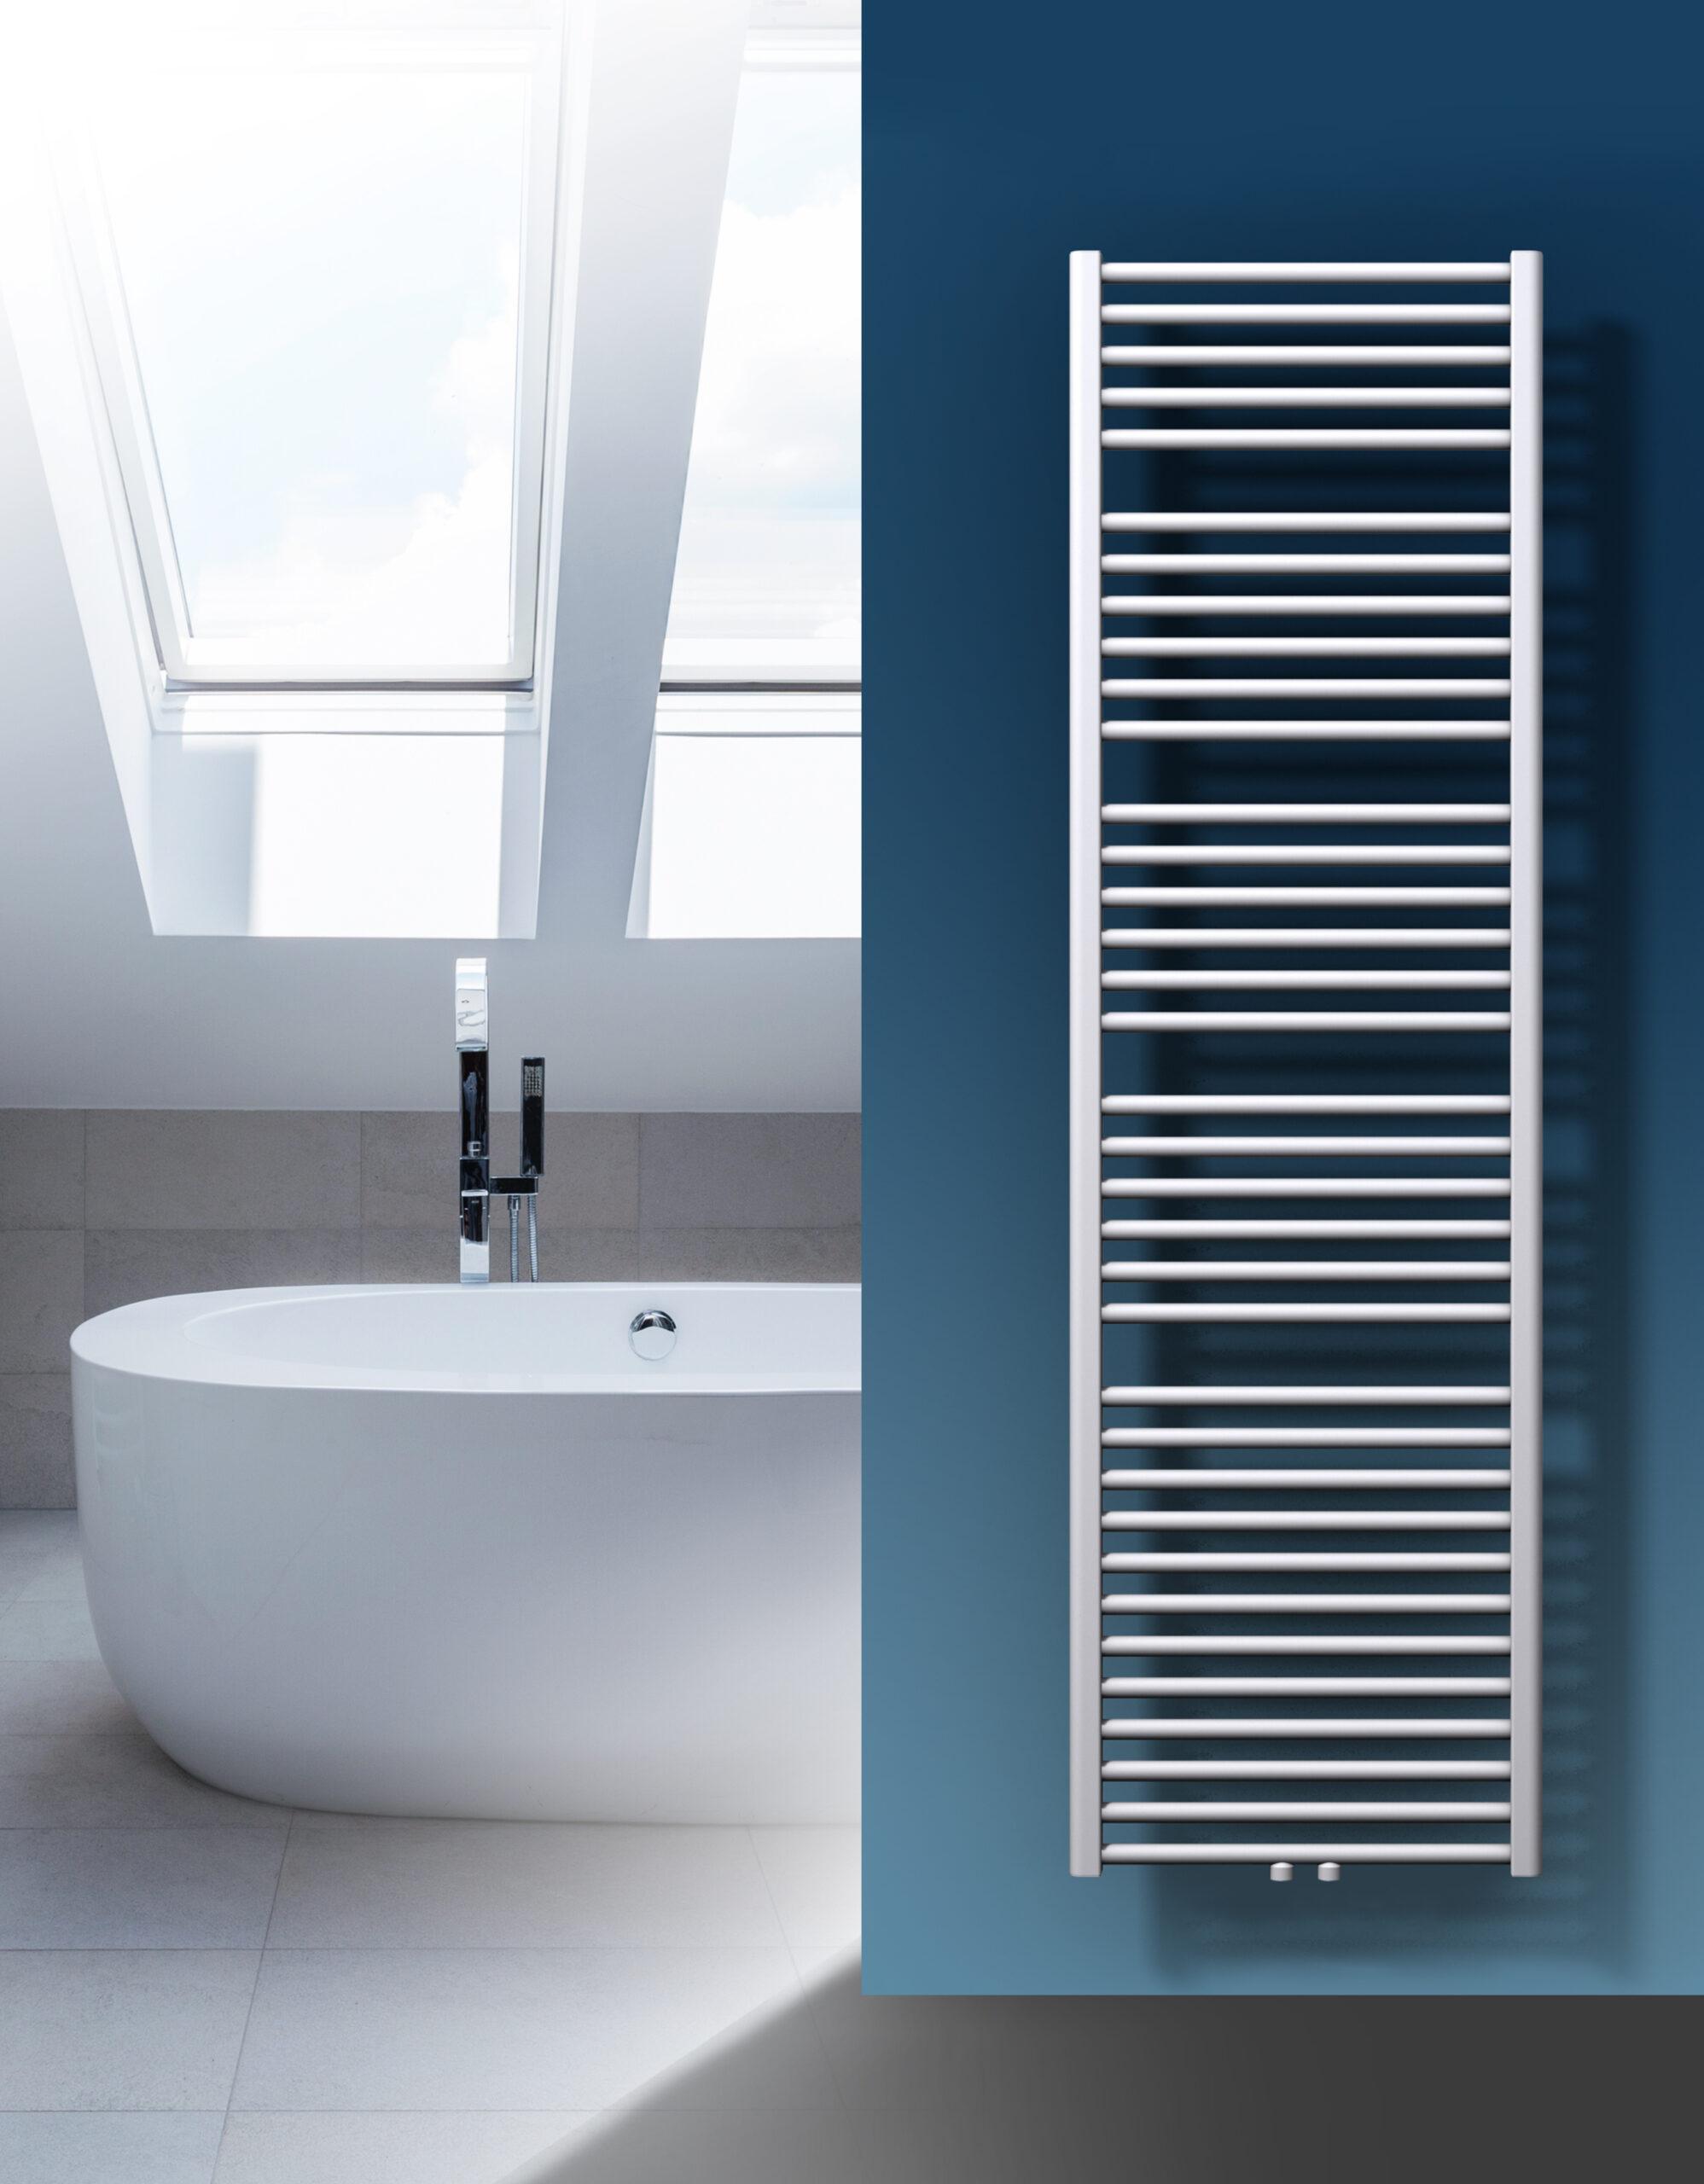 Full Size of Heizkörper Wohnzimmer Bad Elektroheizkörper Badezimmer Für Wohnzimmer Vasco Heizkörper